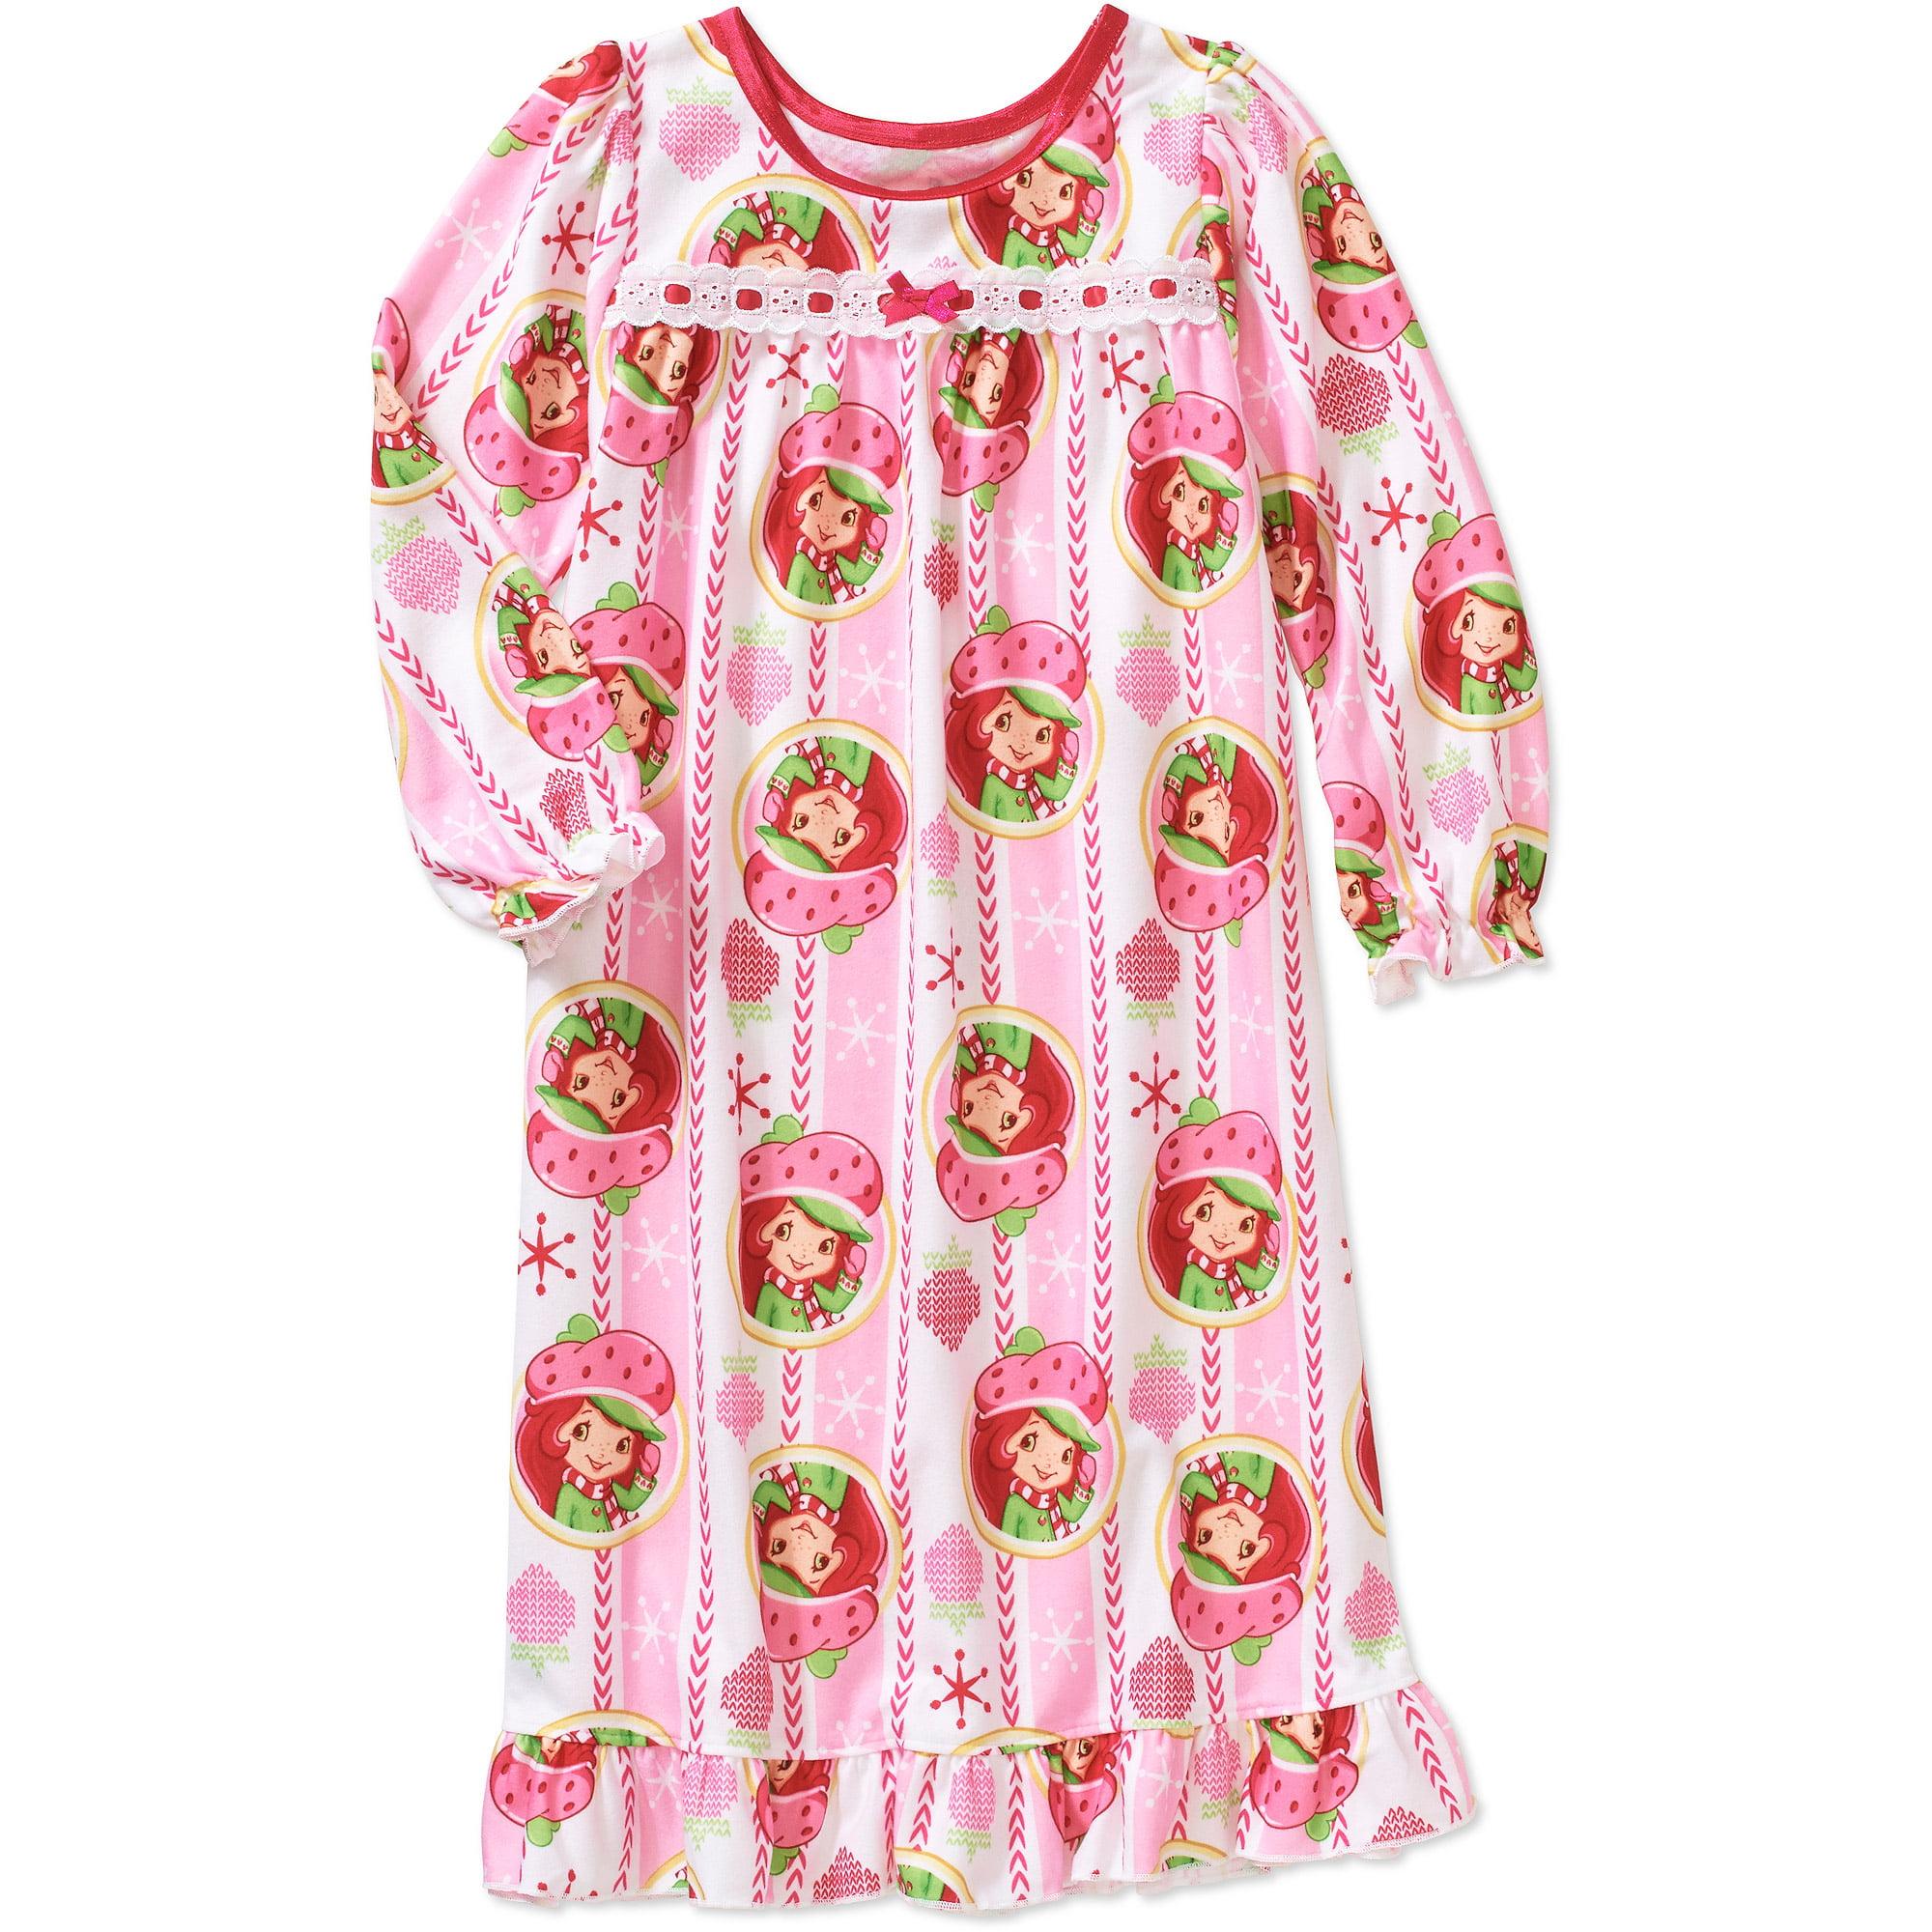 Baby Toddler Girl Strawberry Shortcake Baby Nightgown Walmart